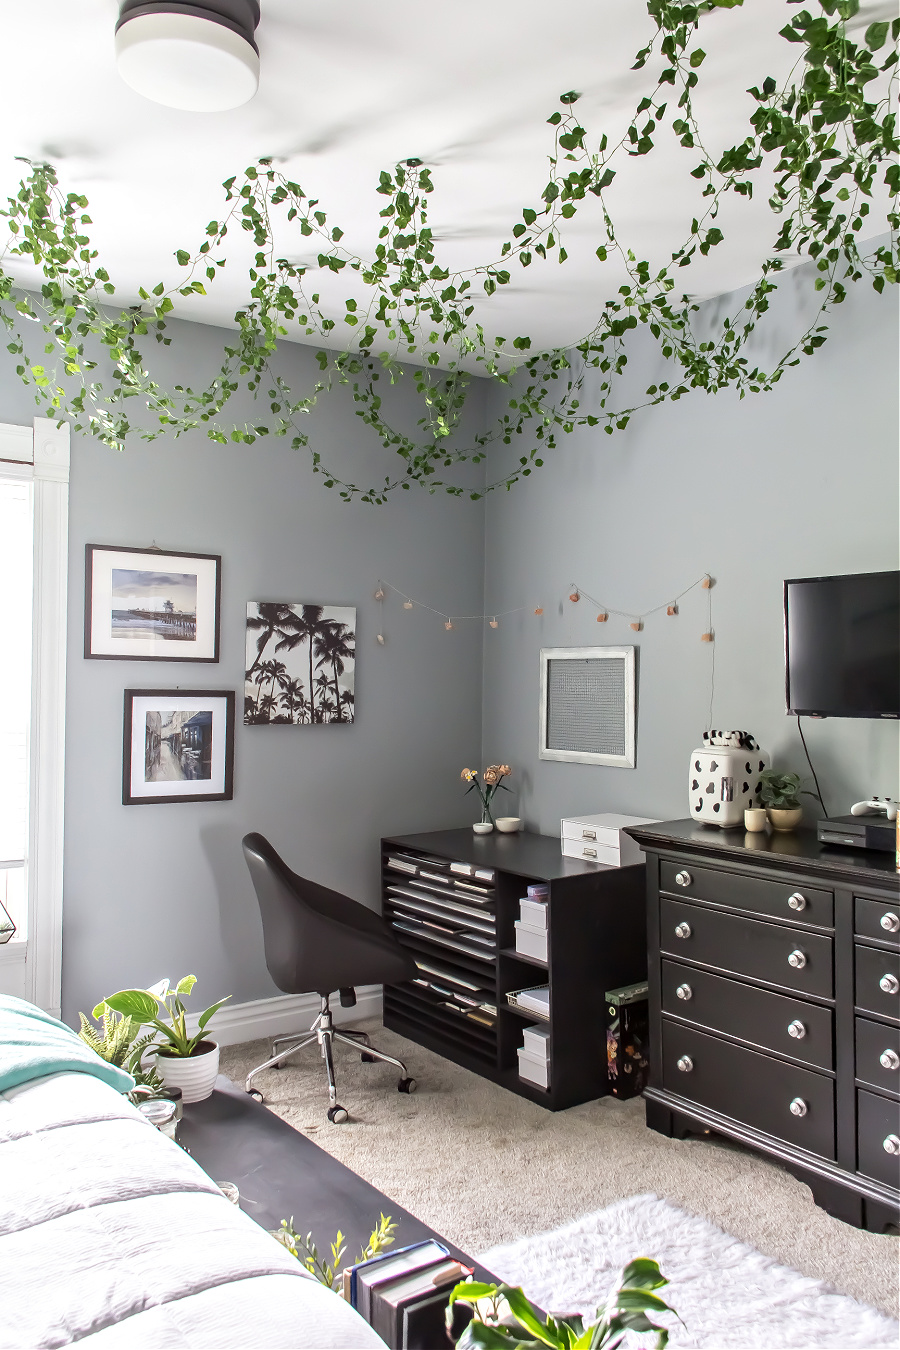 An art and interior design storage cabinet